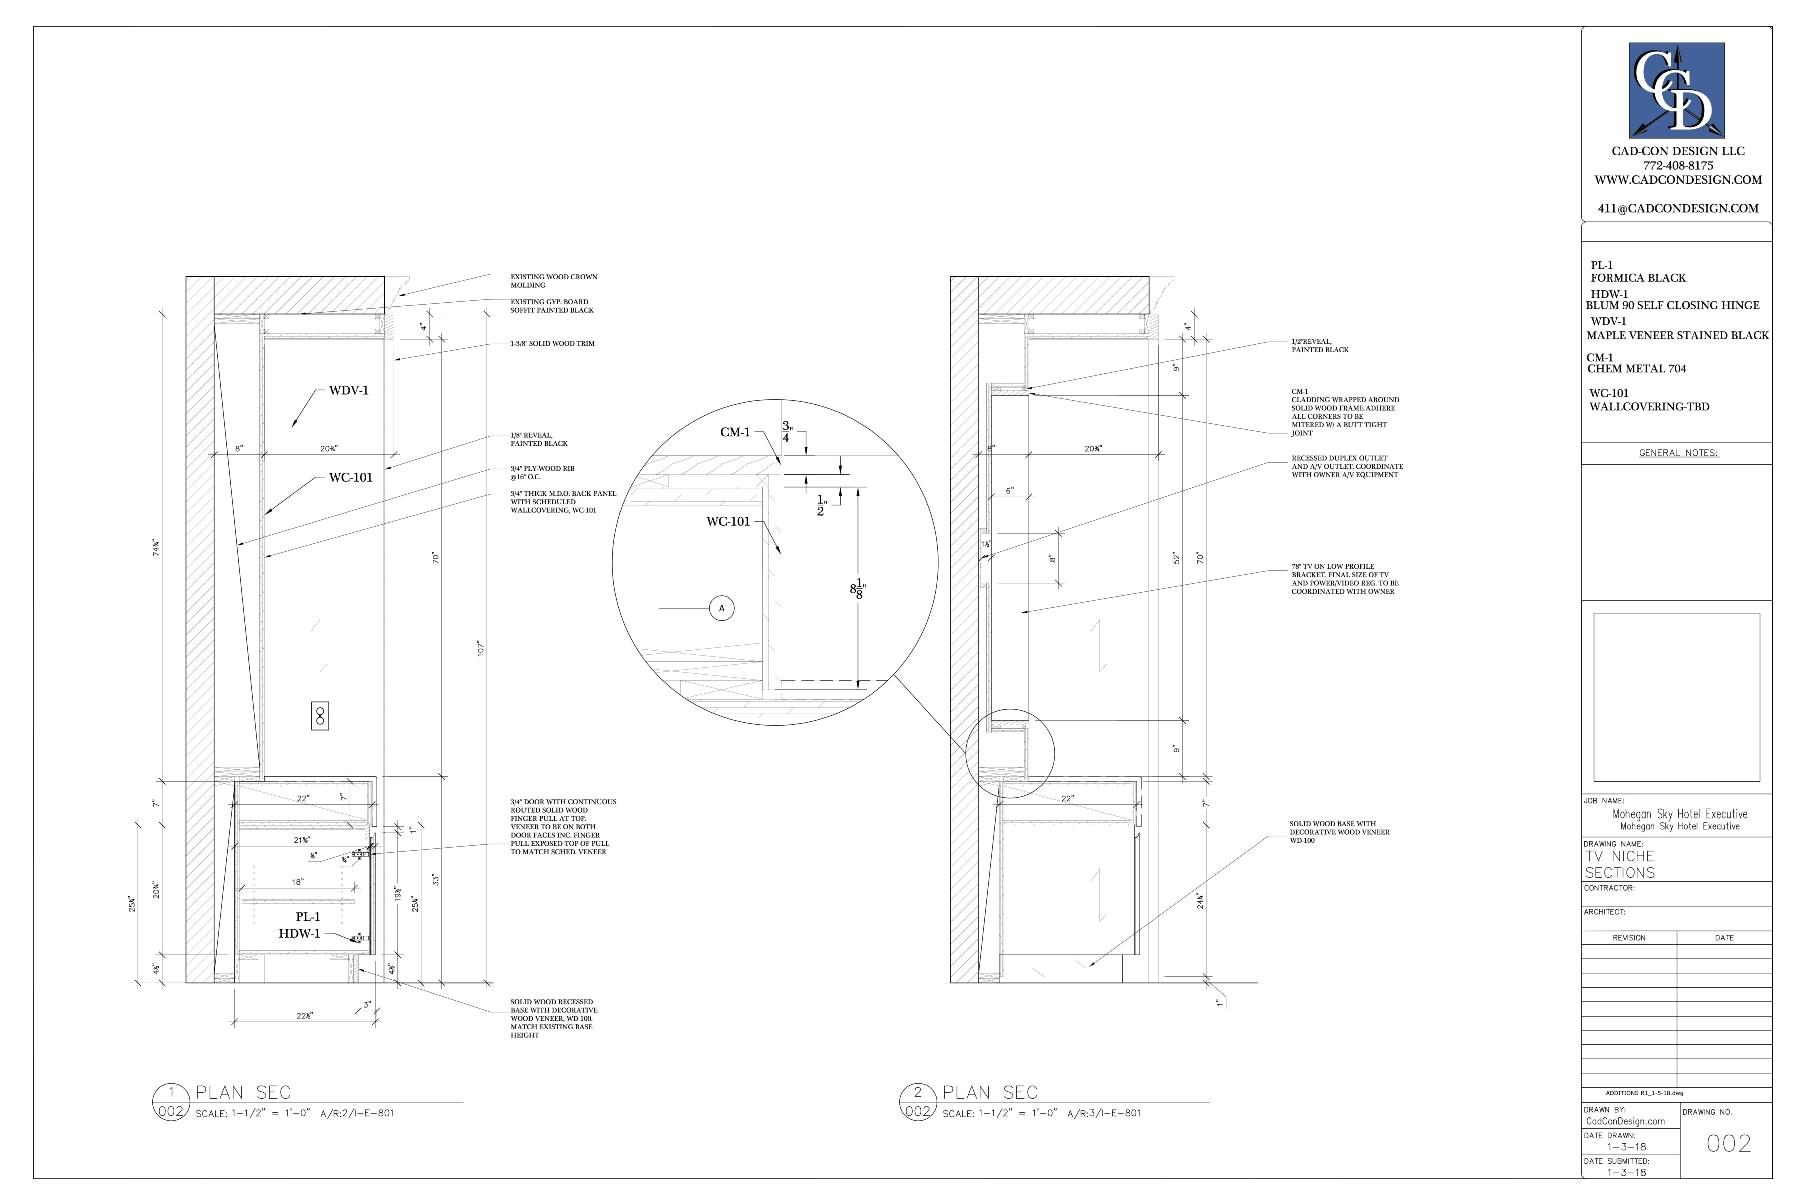 Millwork Shop Drawings 2018 - Millwork Shop Drawings By ...